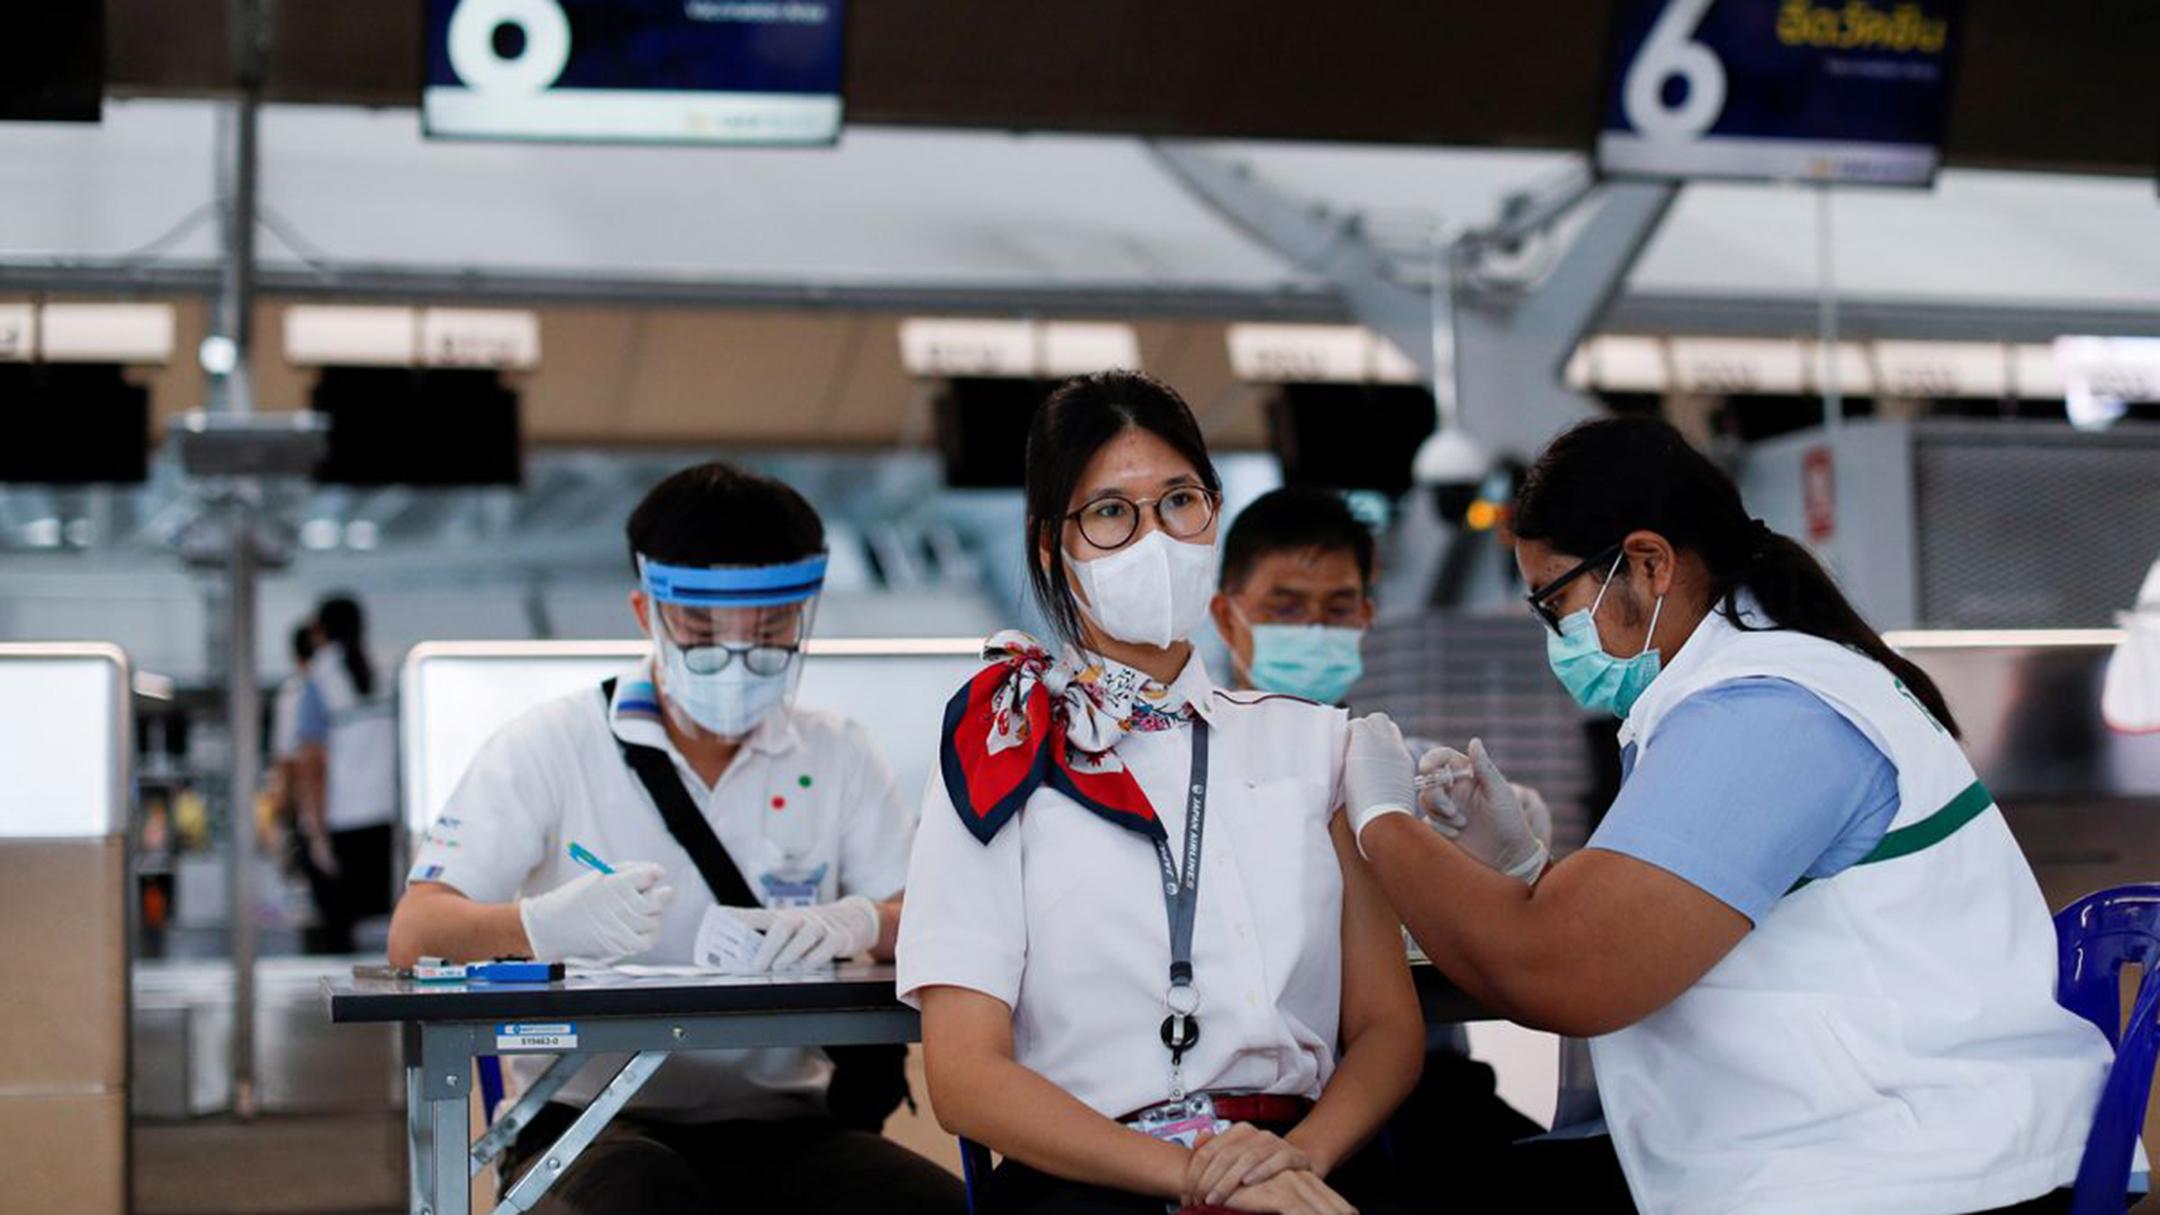 Sandbox tourists stuck in quarantine ask to go home